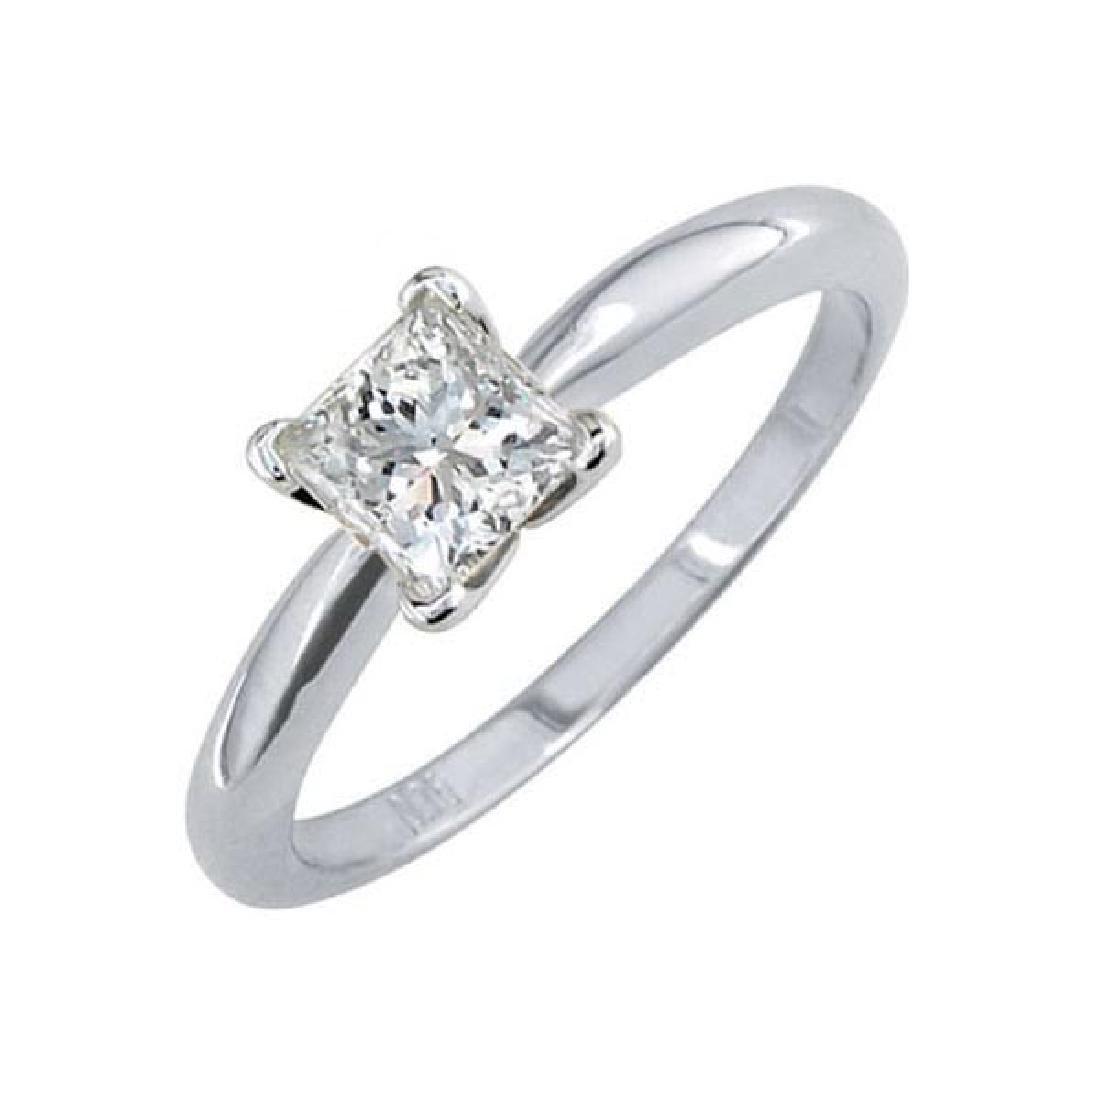 Certified 1.08 CTW Princess Diamond Solitaire 14k Ring